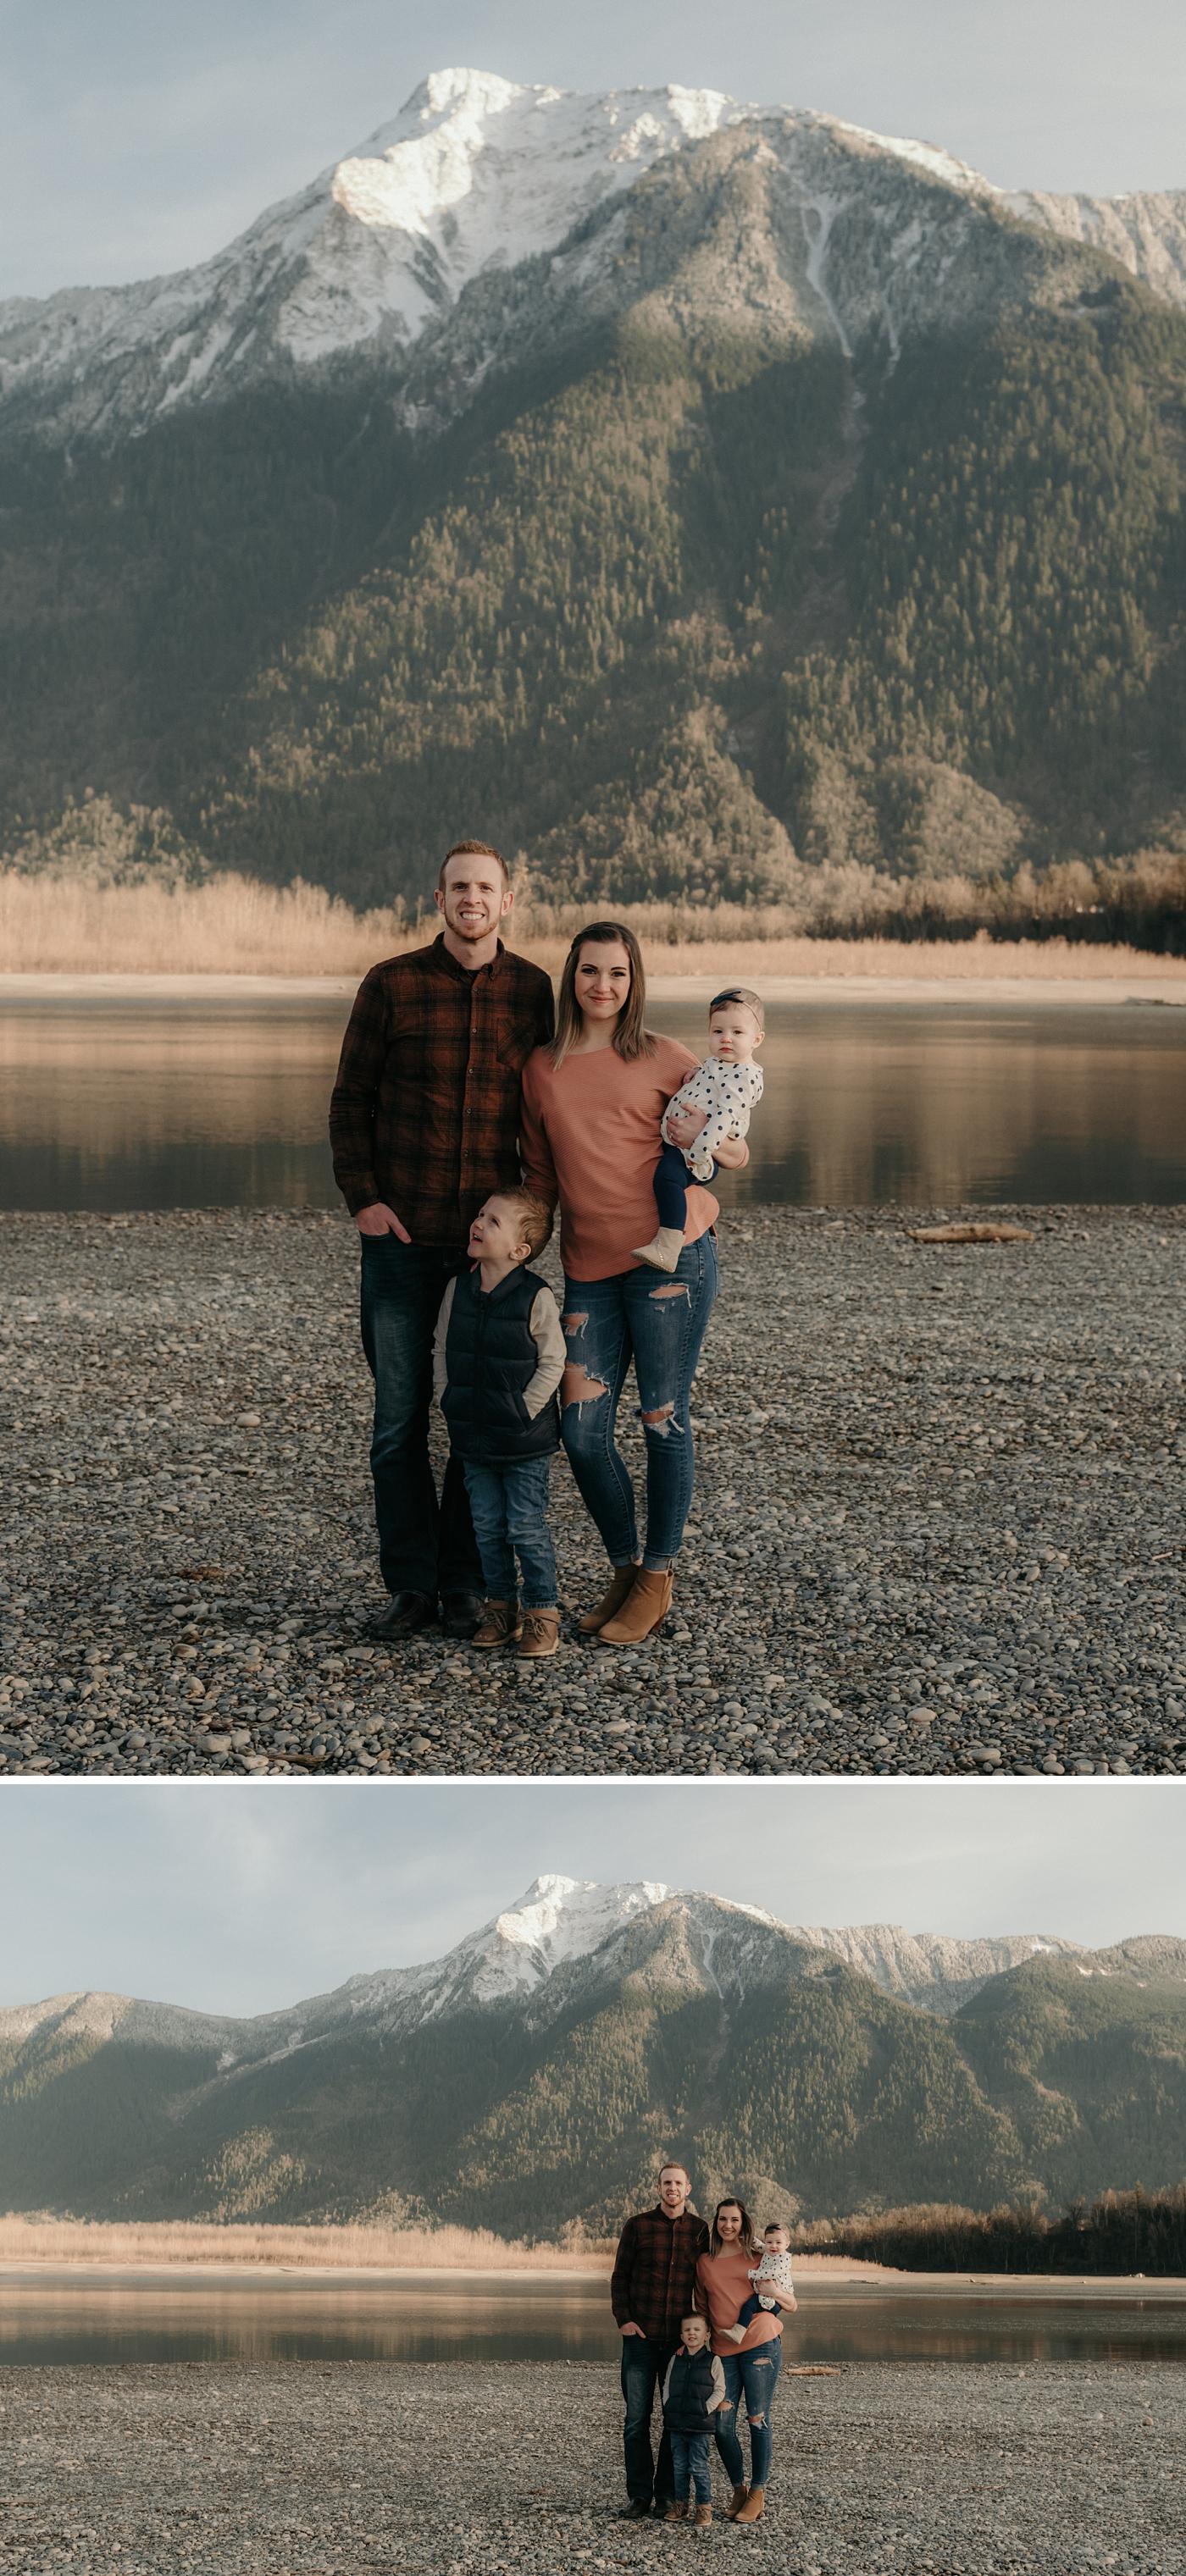 Airy-Mountain-Agassiz-Family-Photography_0001.jpg